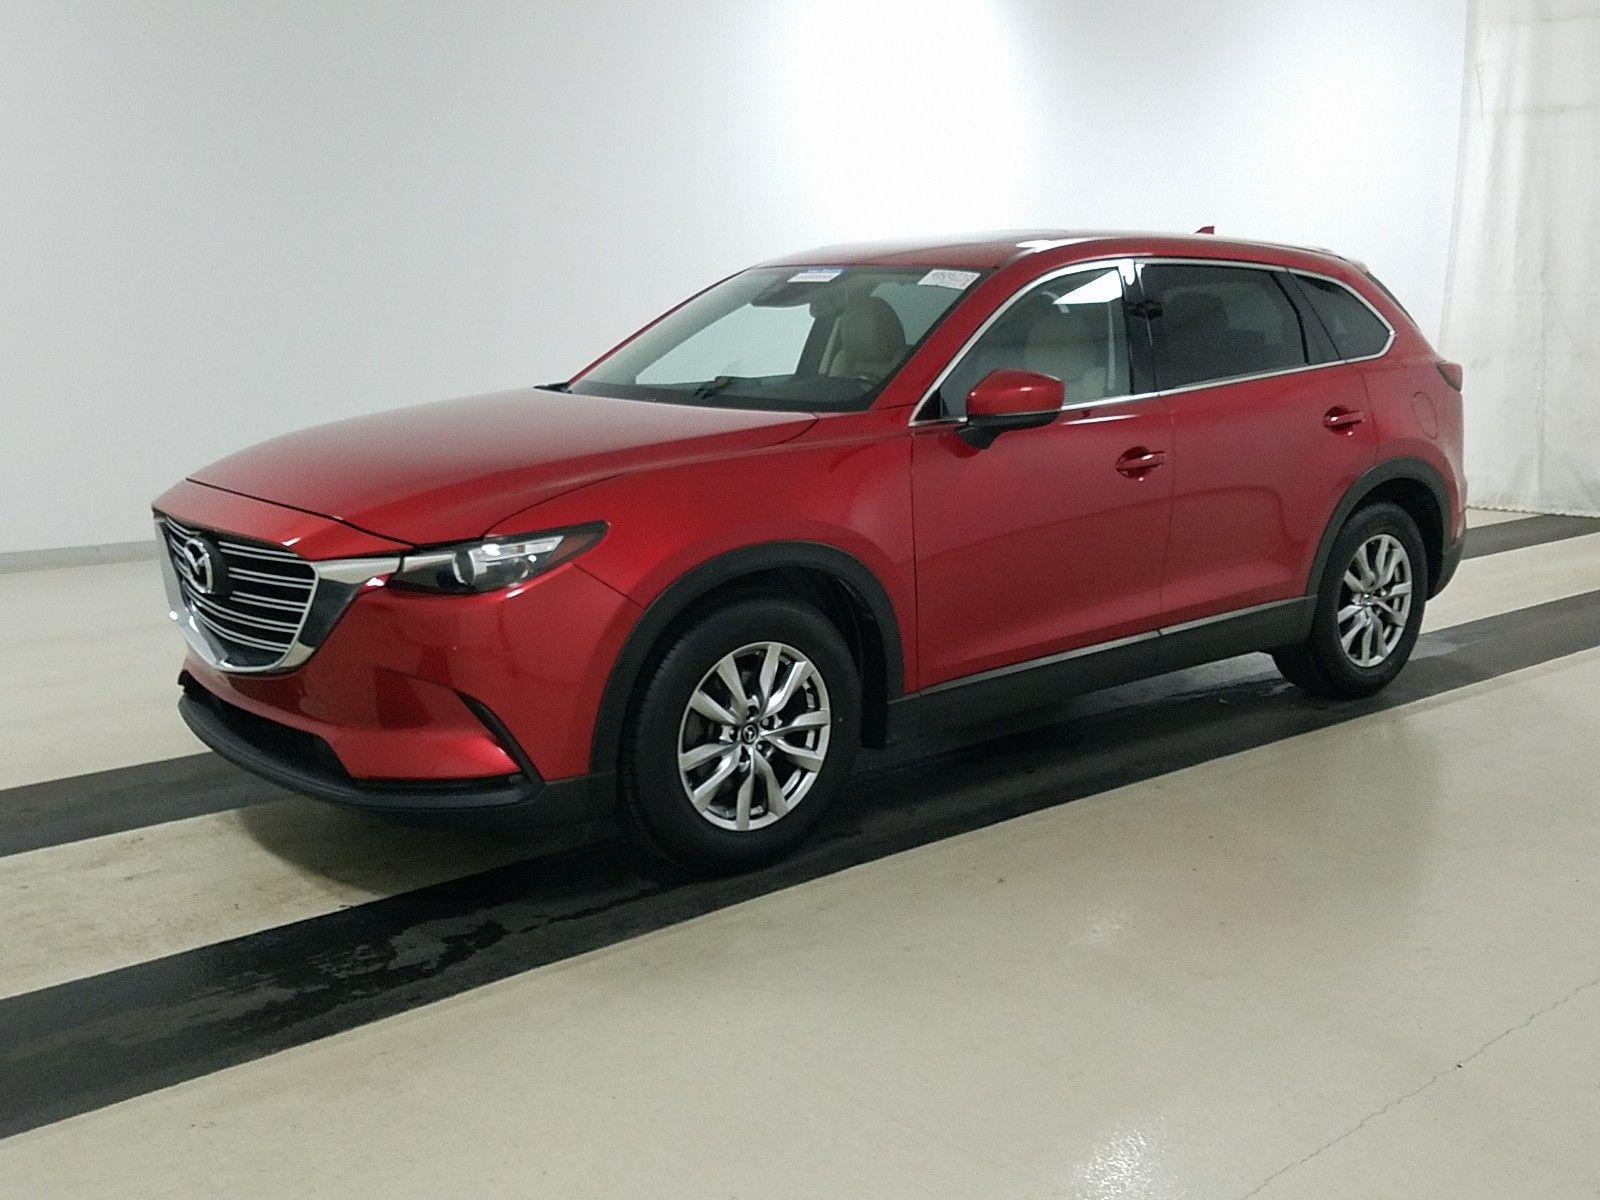 2016 Mazda Cx-9 2.5. Lot 99915938695 Vin JM3TCACY3G0119450